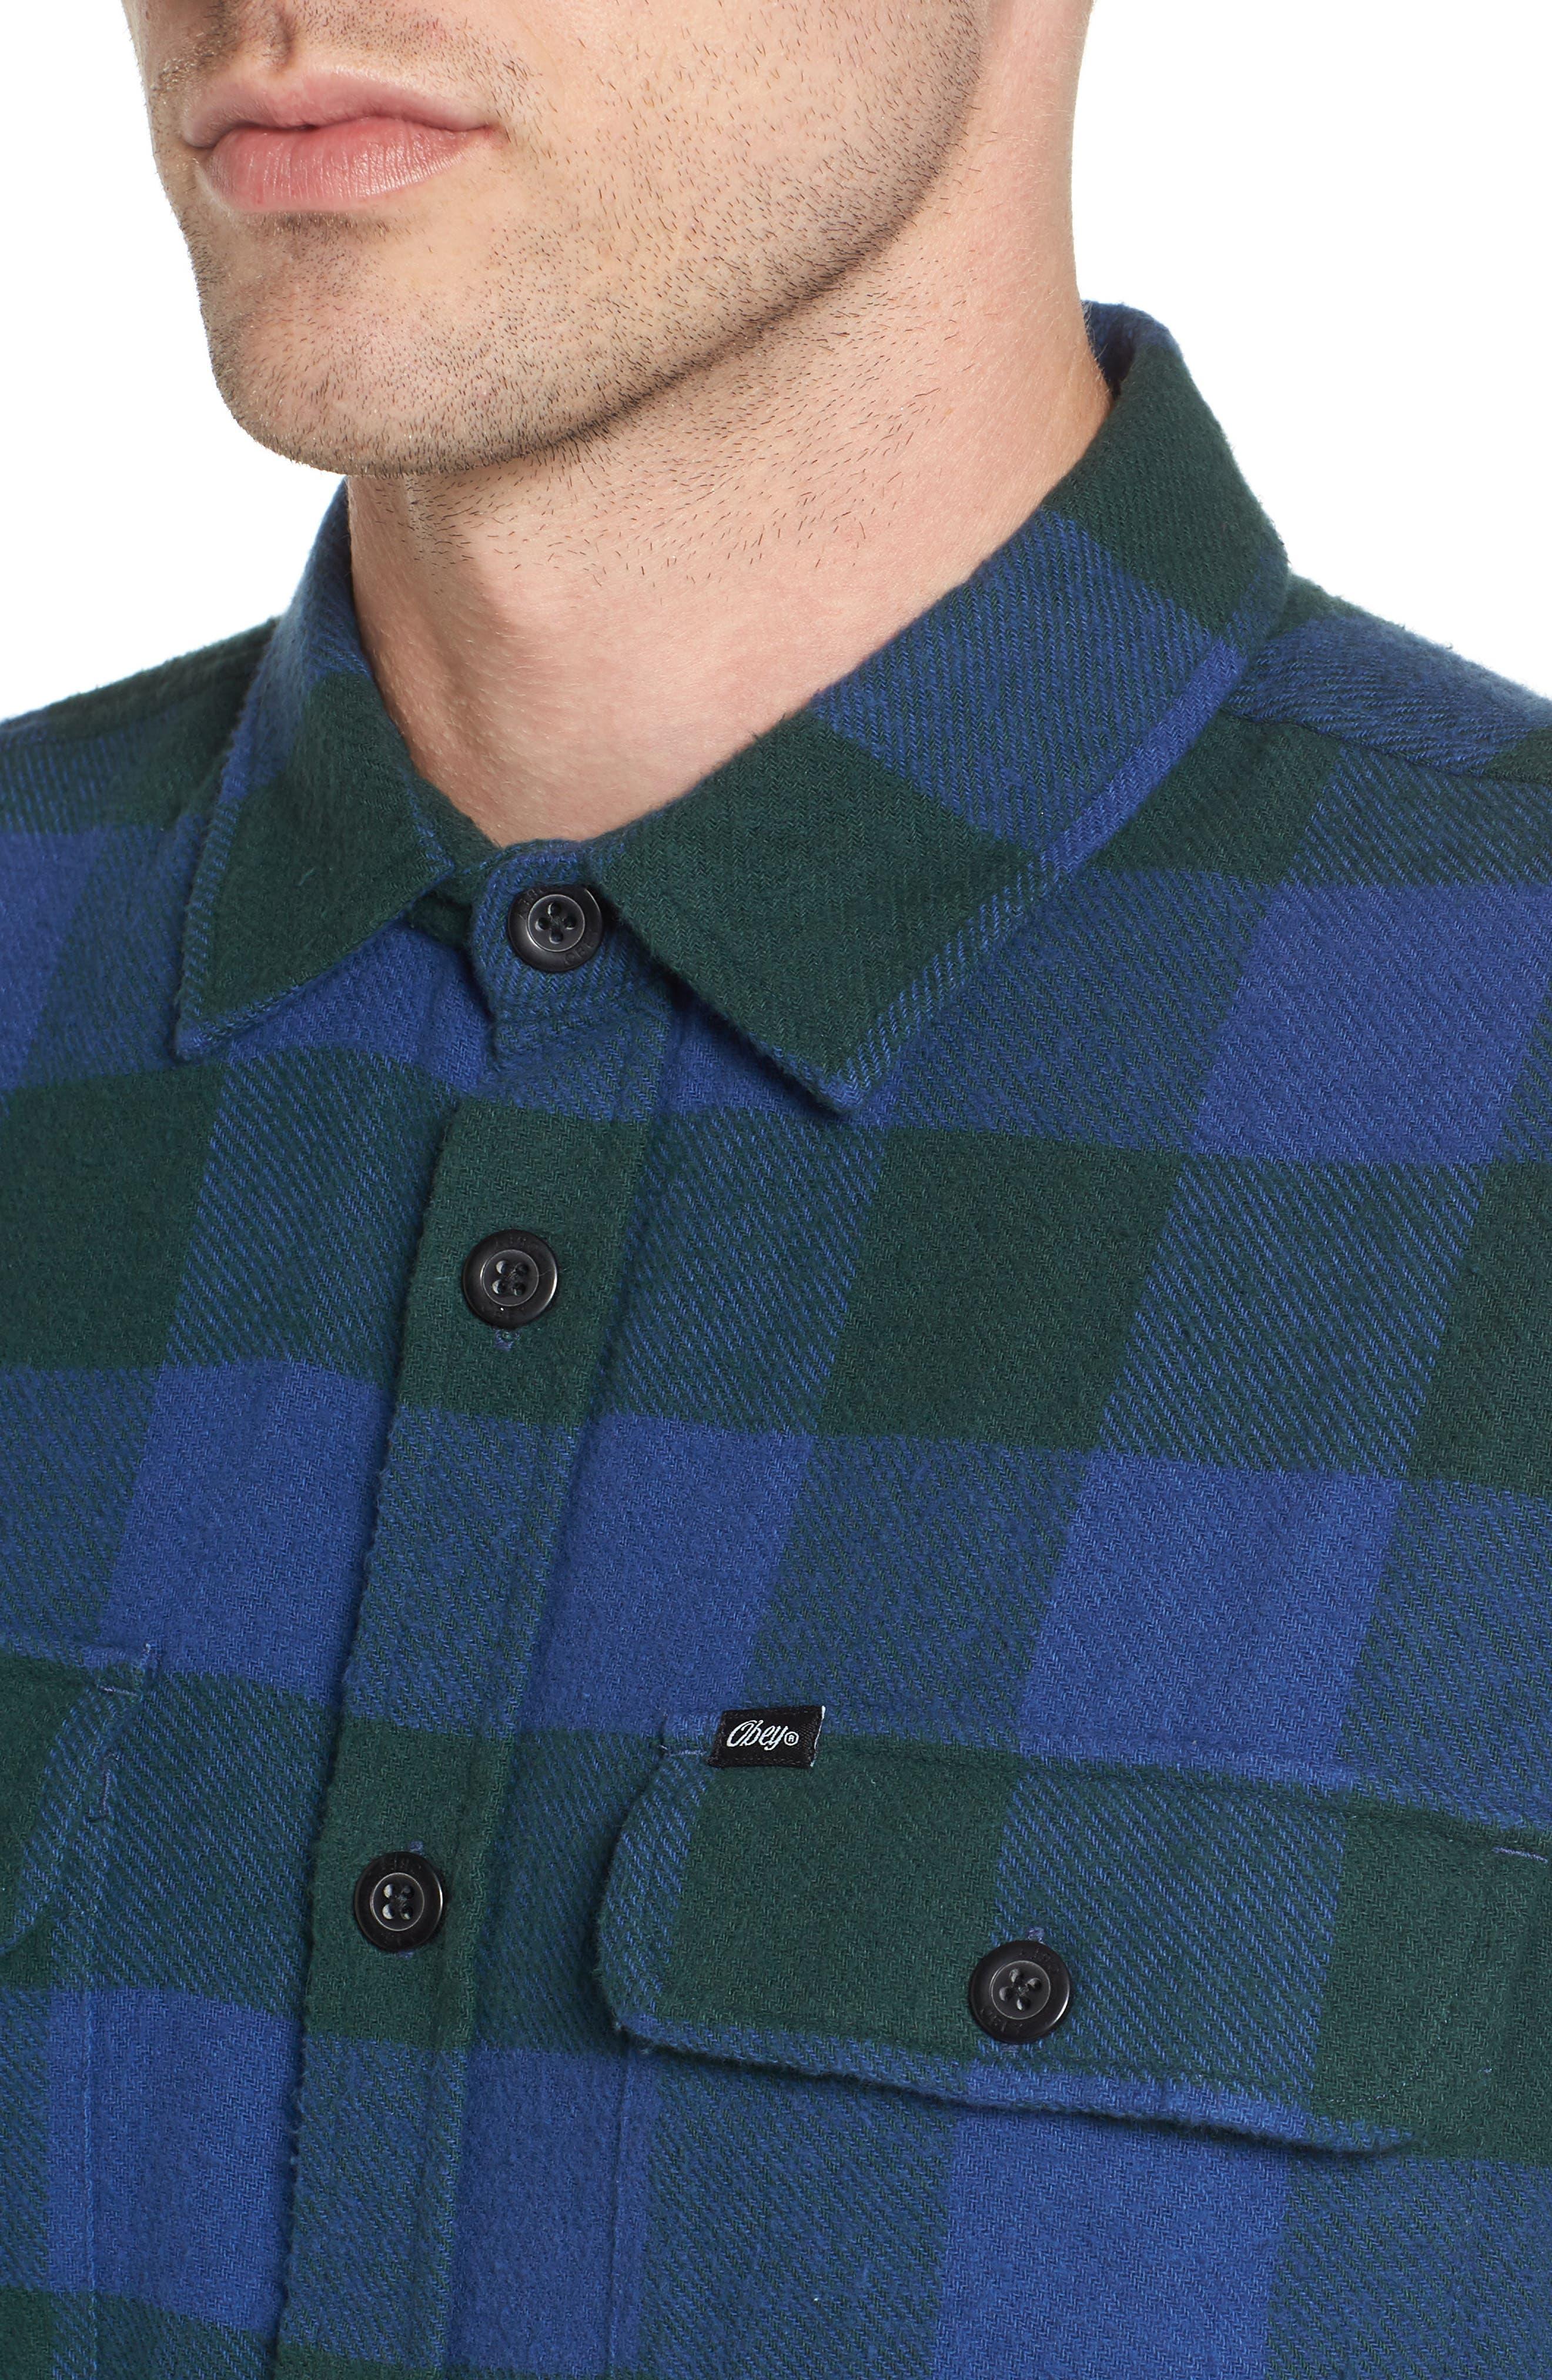 Trent Check Woven Shirt,                             Alternate thumbnail 4, color,                             Navy Multi